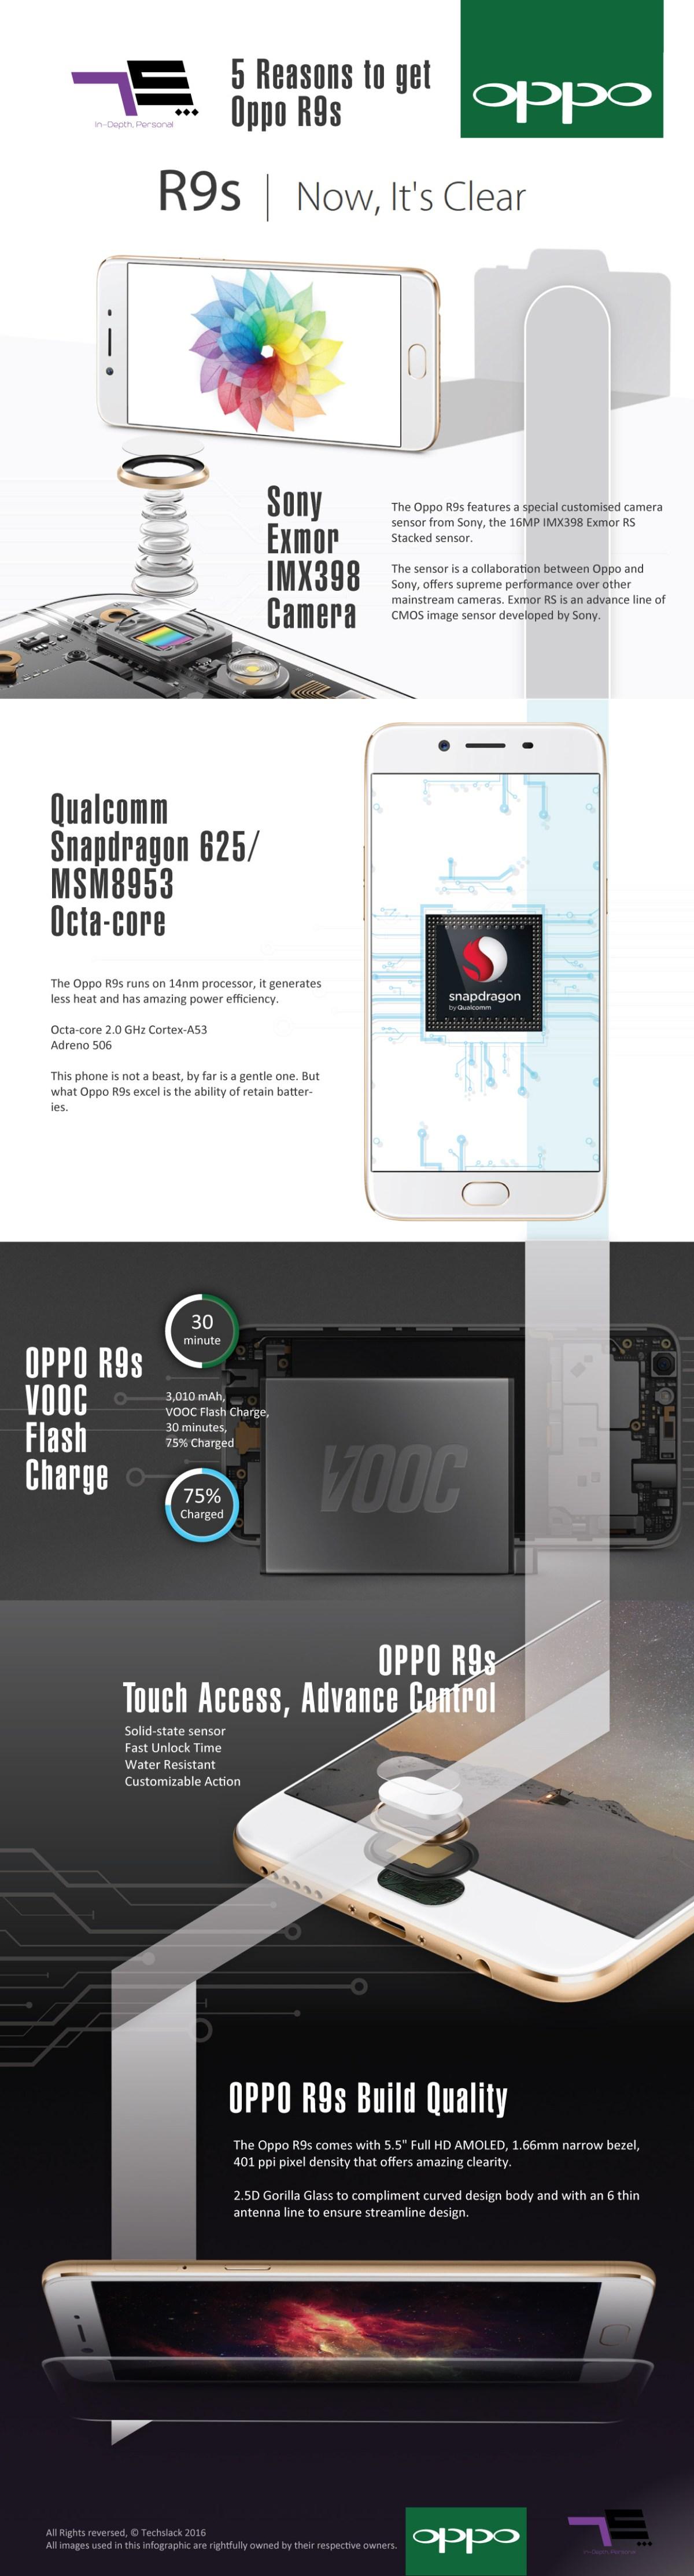 Oppo R9s Inforgraphic